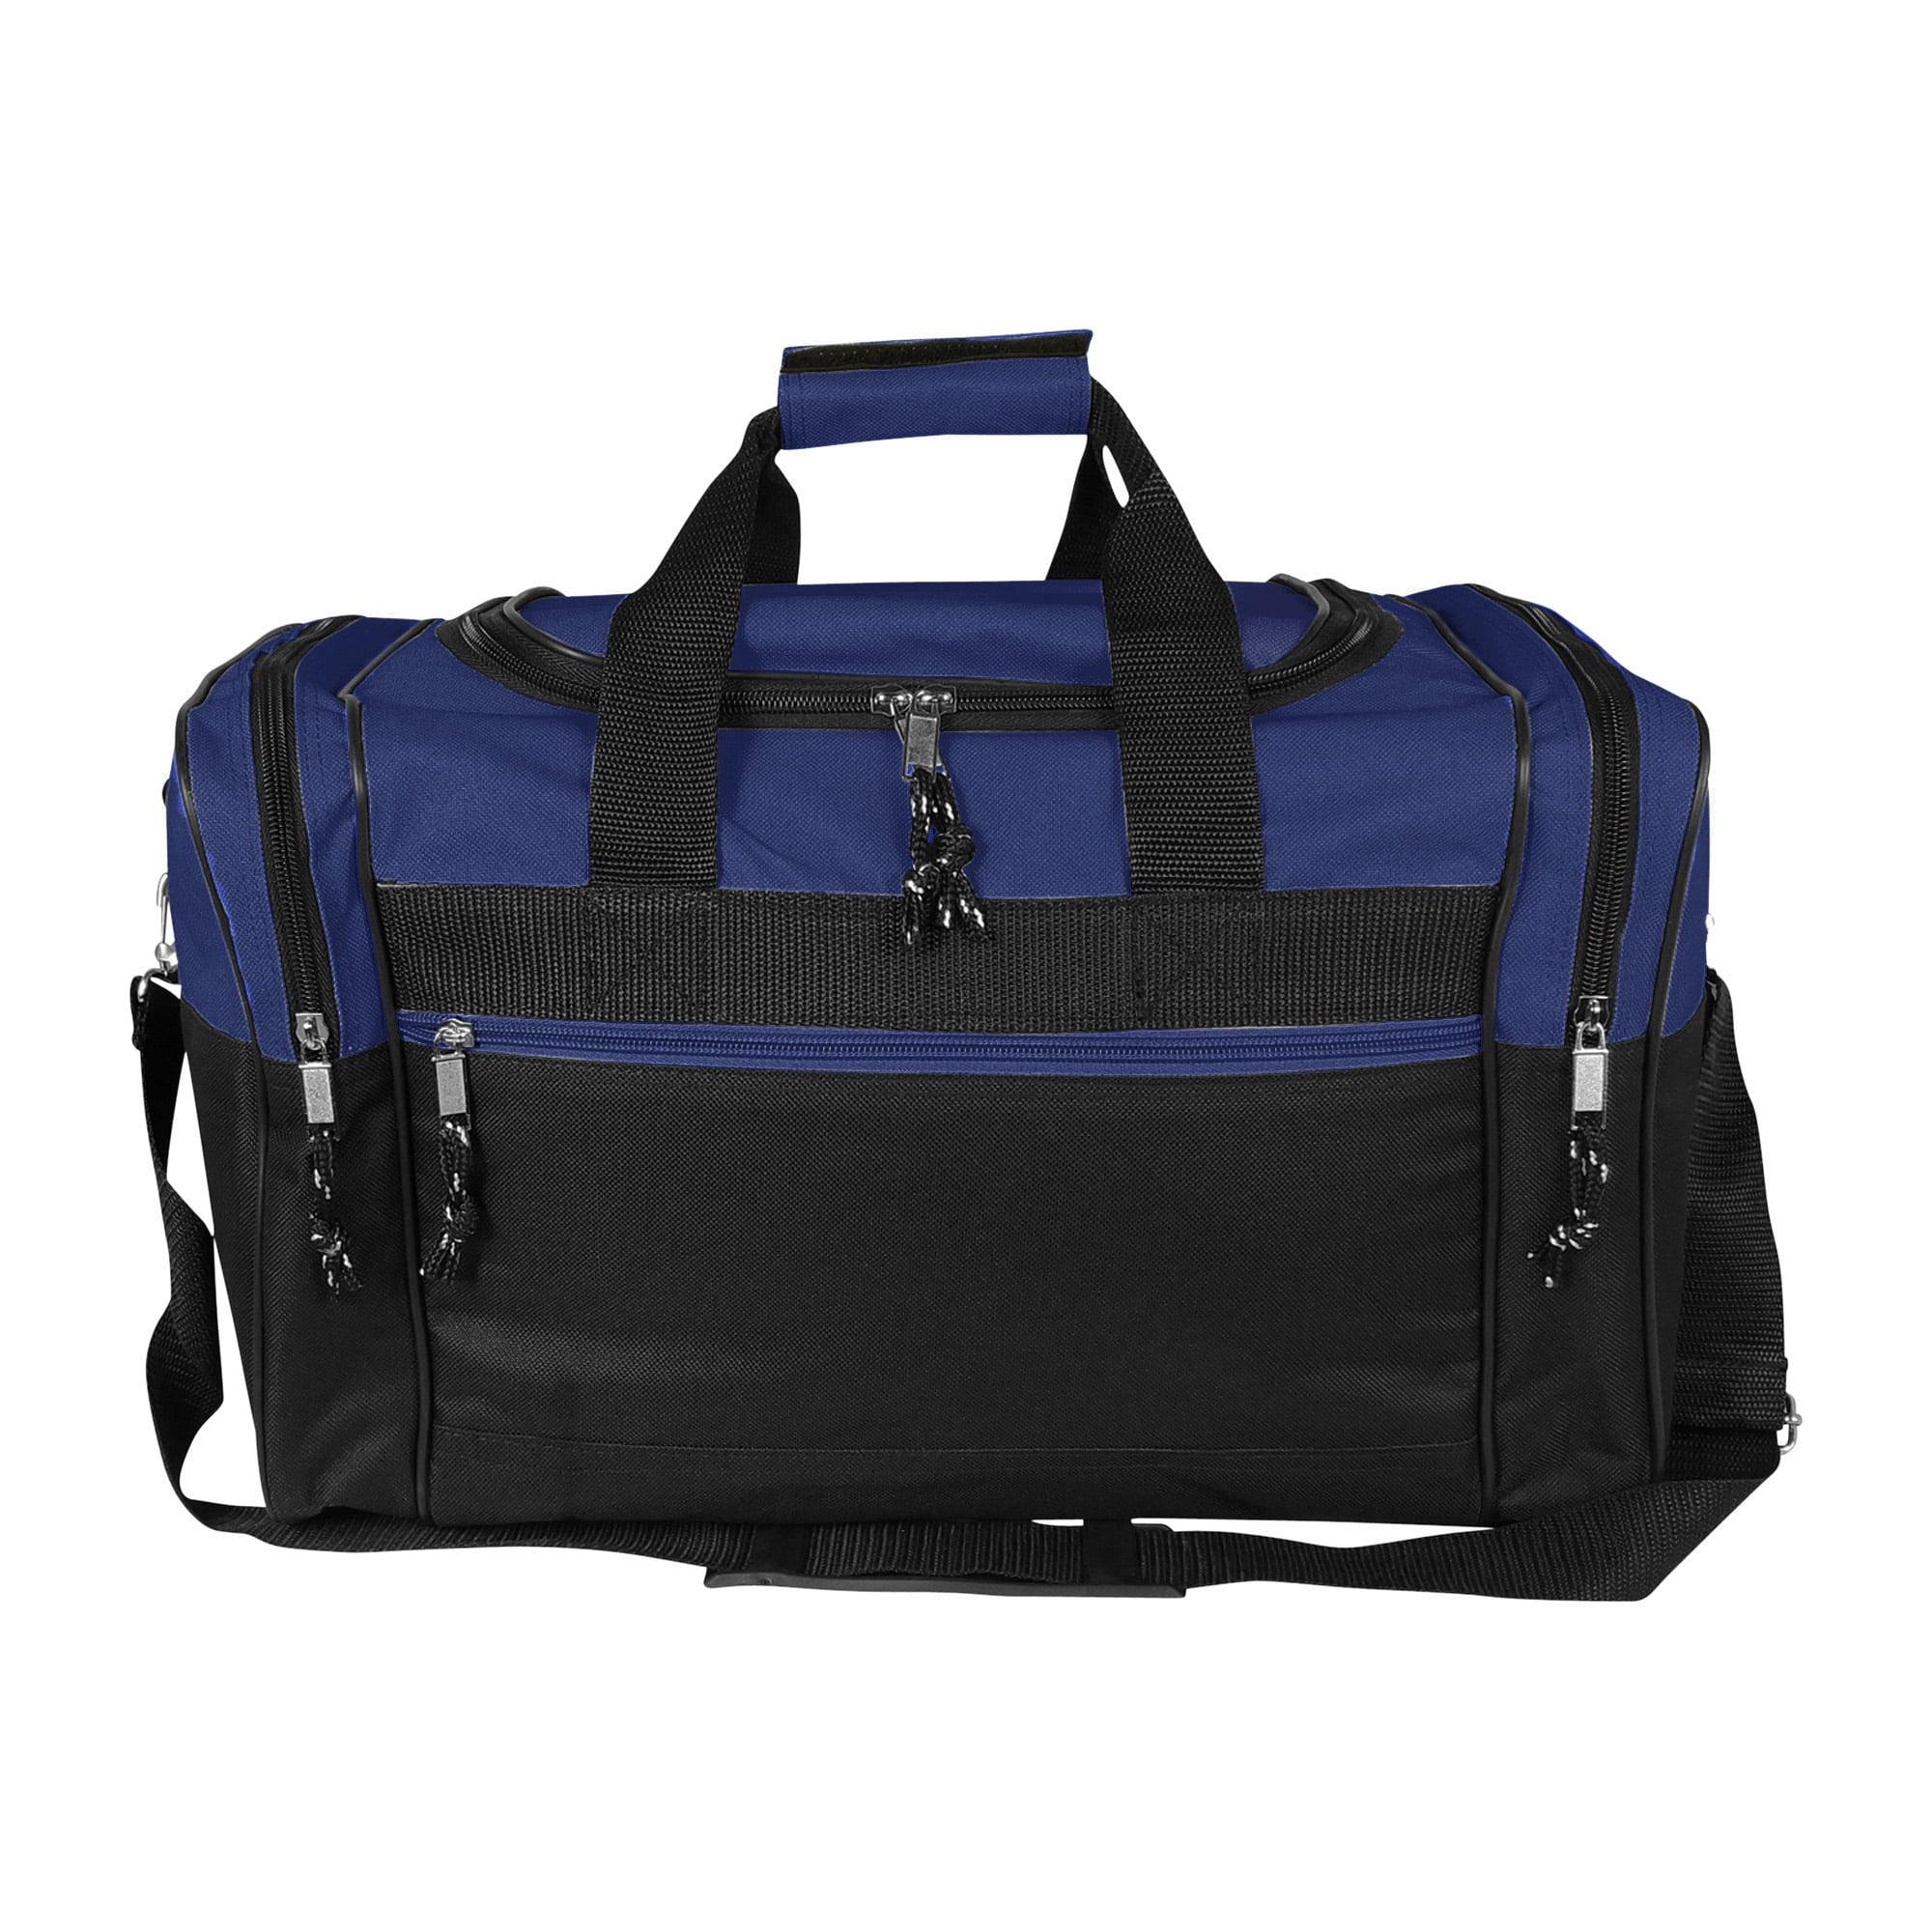 "DALIX 17"" Blank Duffel Bag Duffle Travel Size Sports Durable Gym Bag in Black by DALIX"